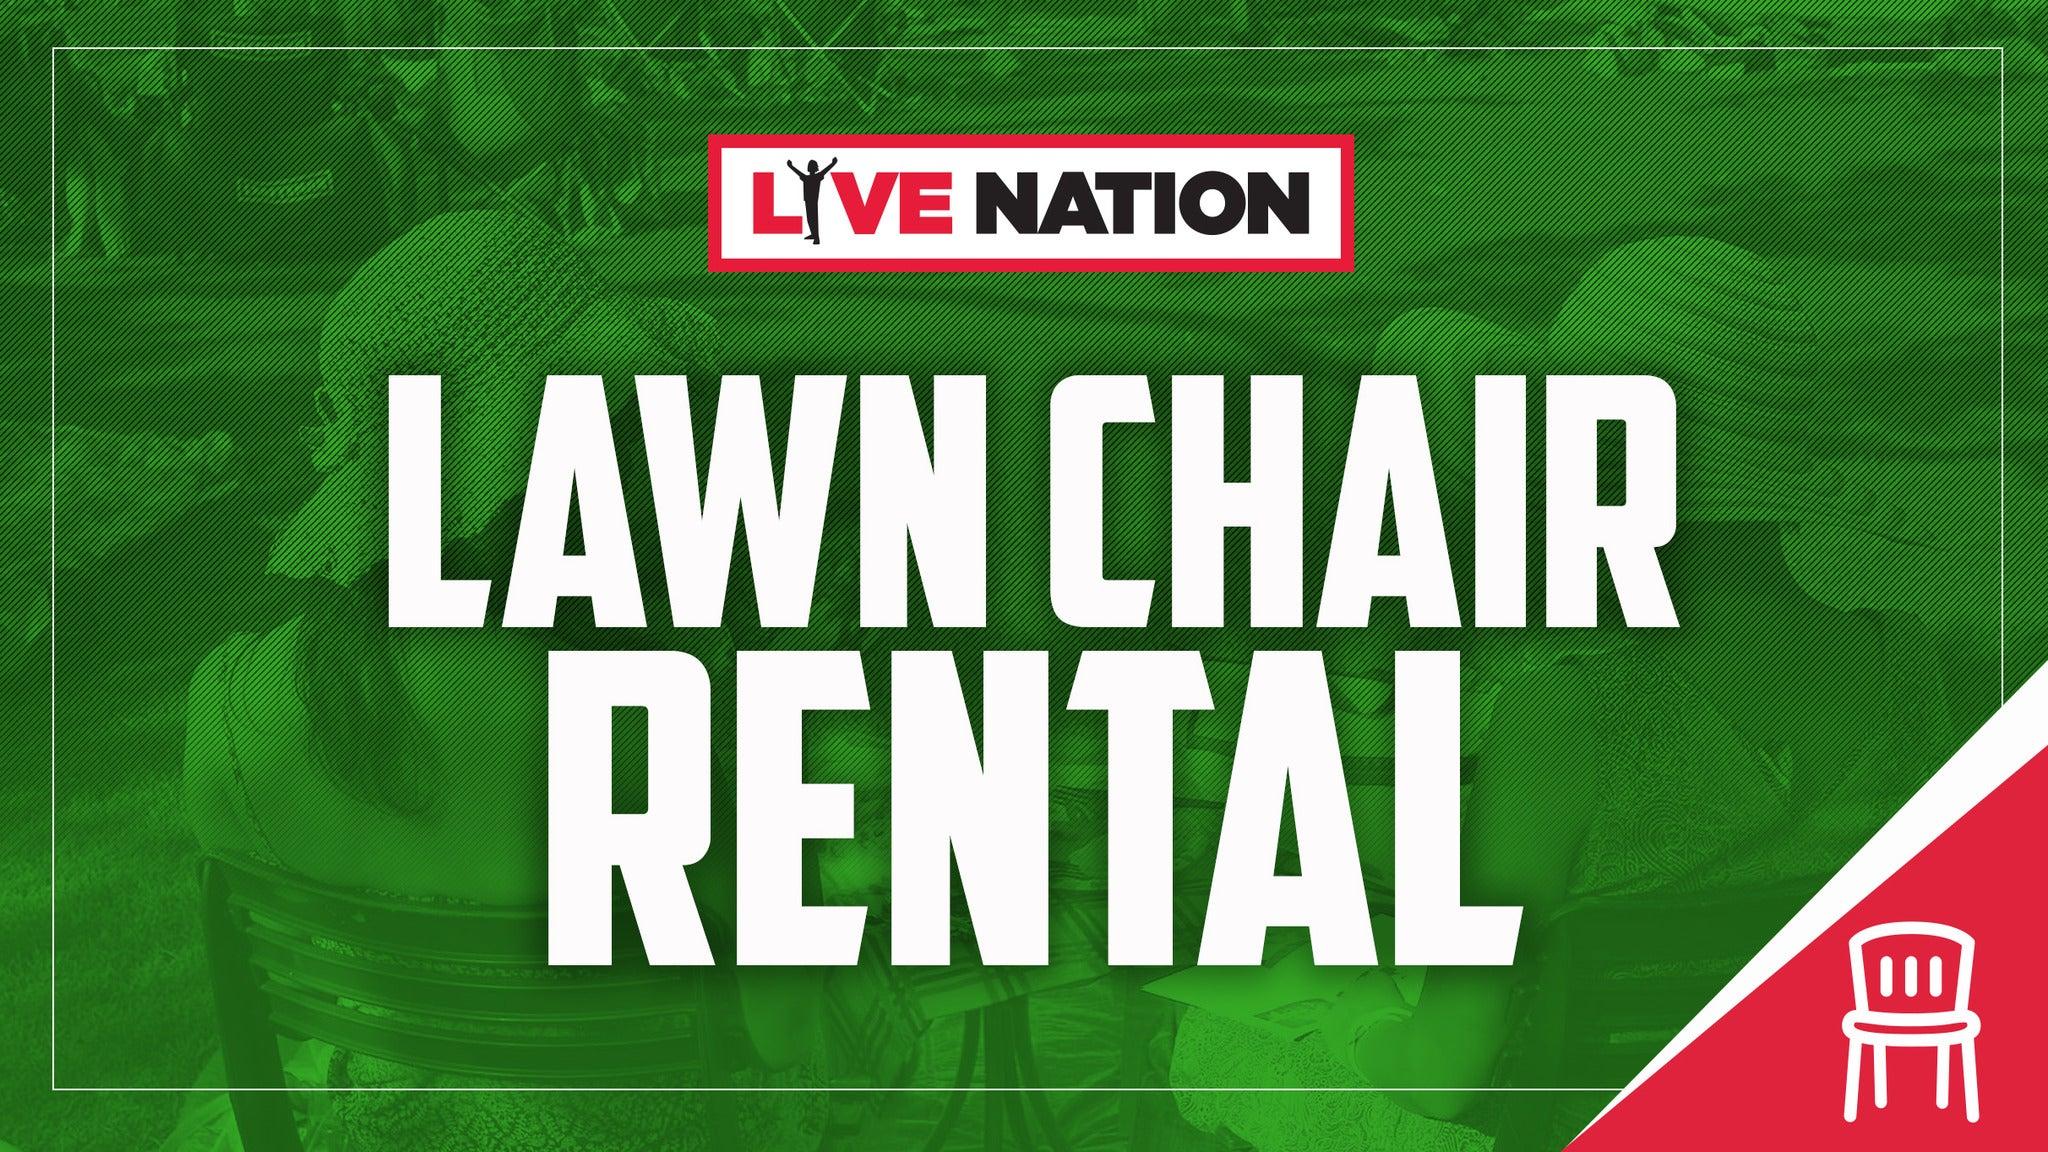 Lawn Chair Voucher: Paramore - NOT a Concert Ticket